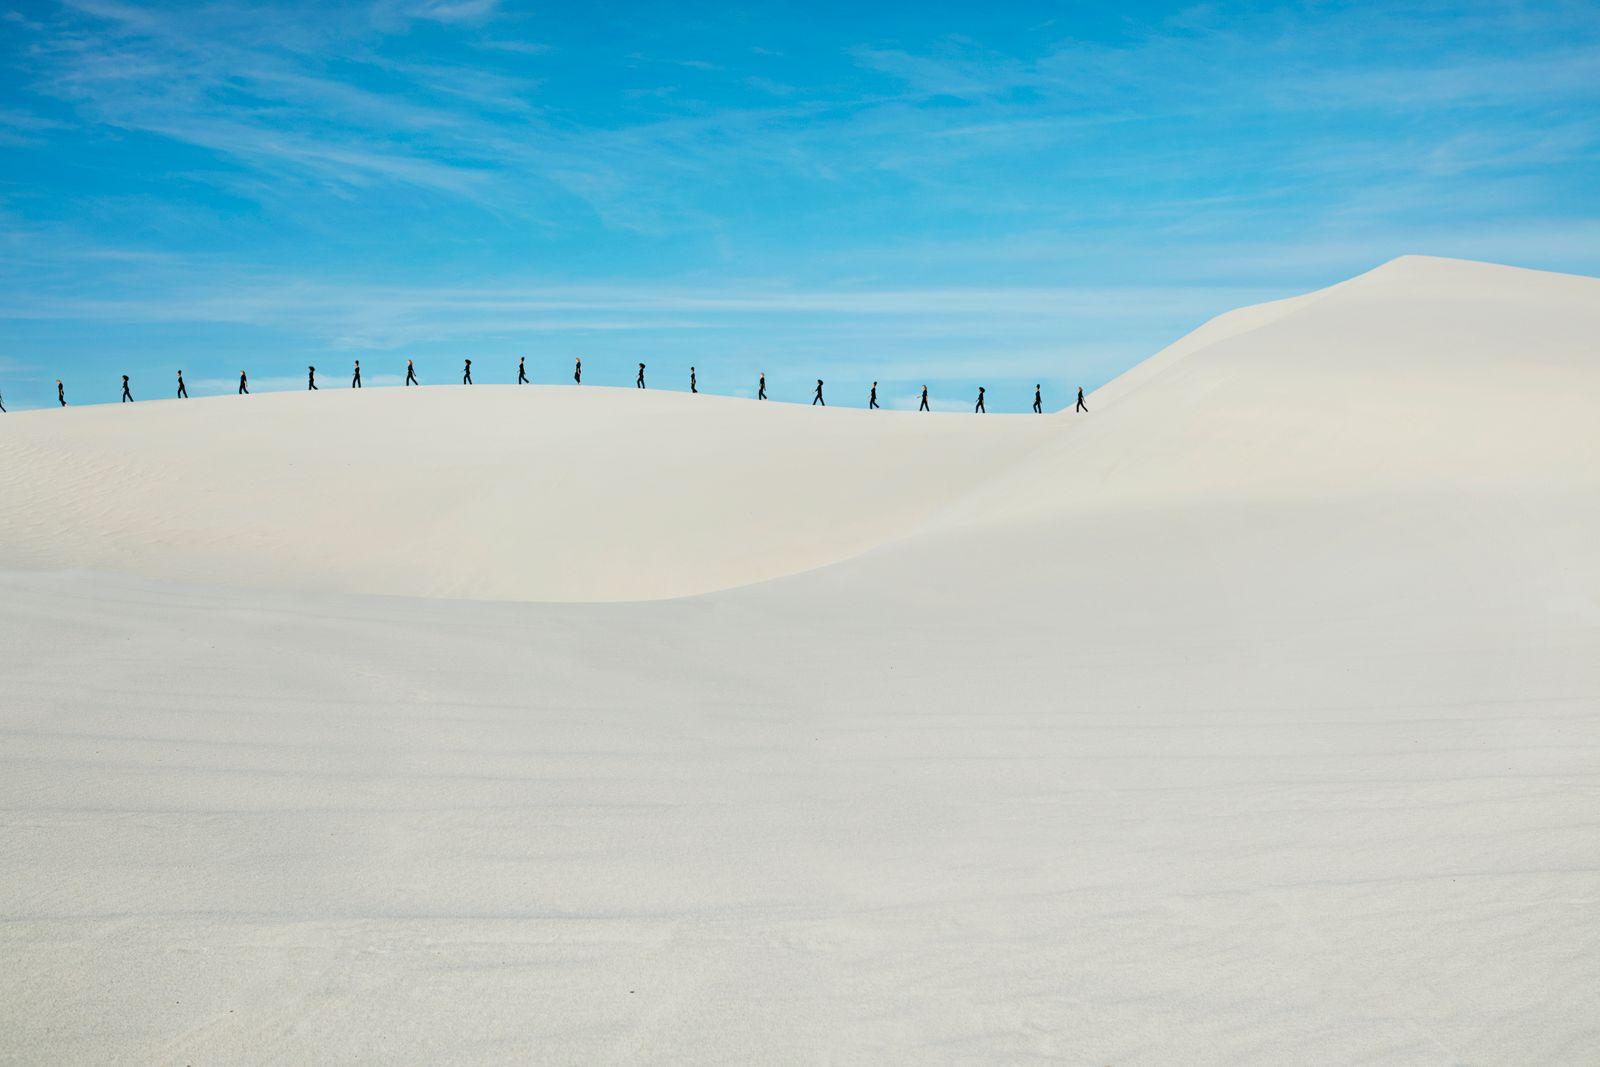 Distant multiple image of fashion models walking on sandy hill at desert